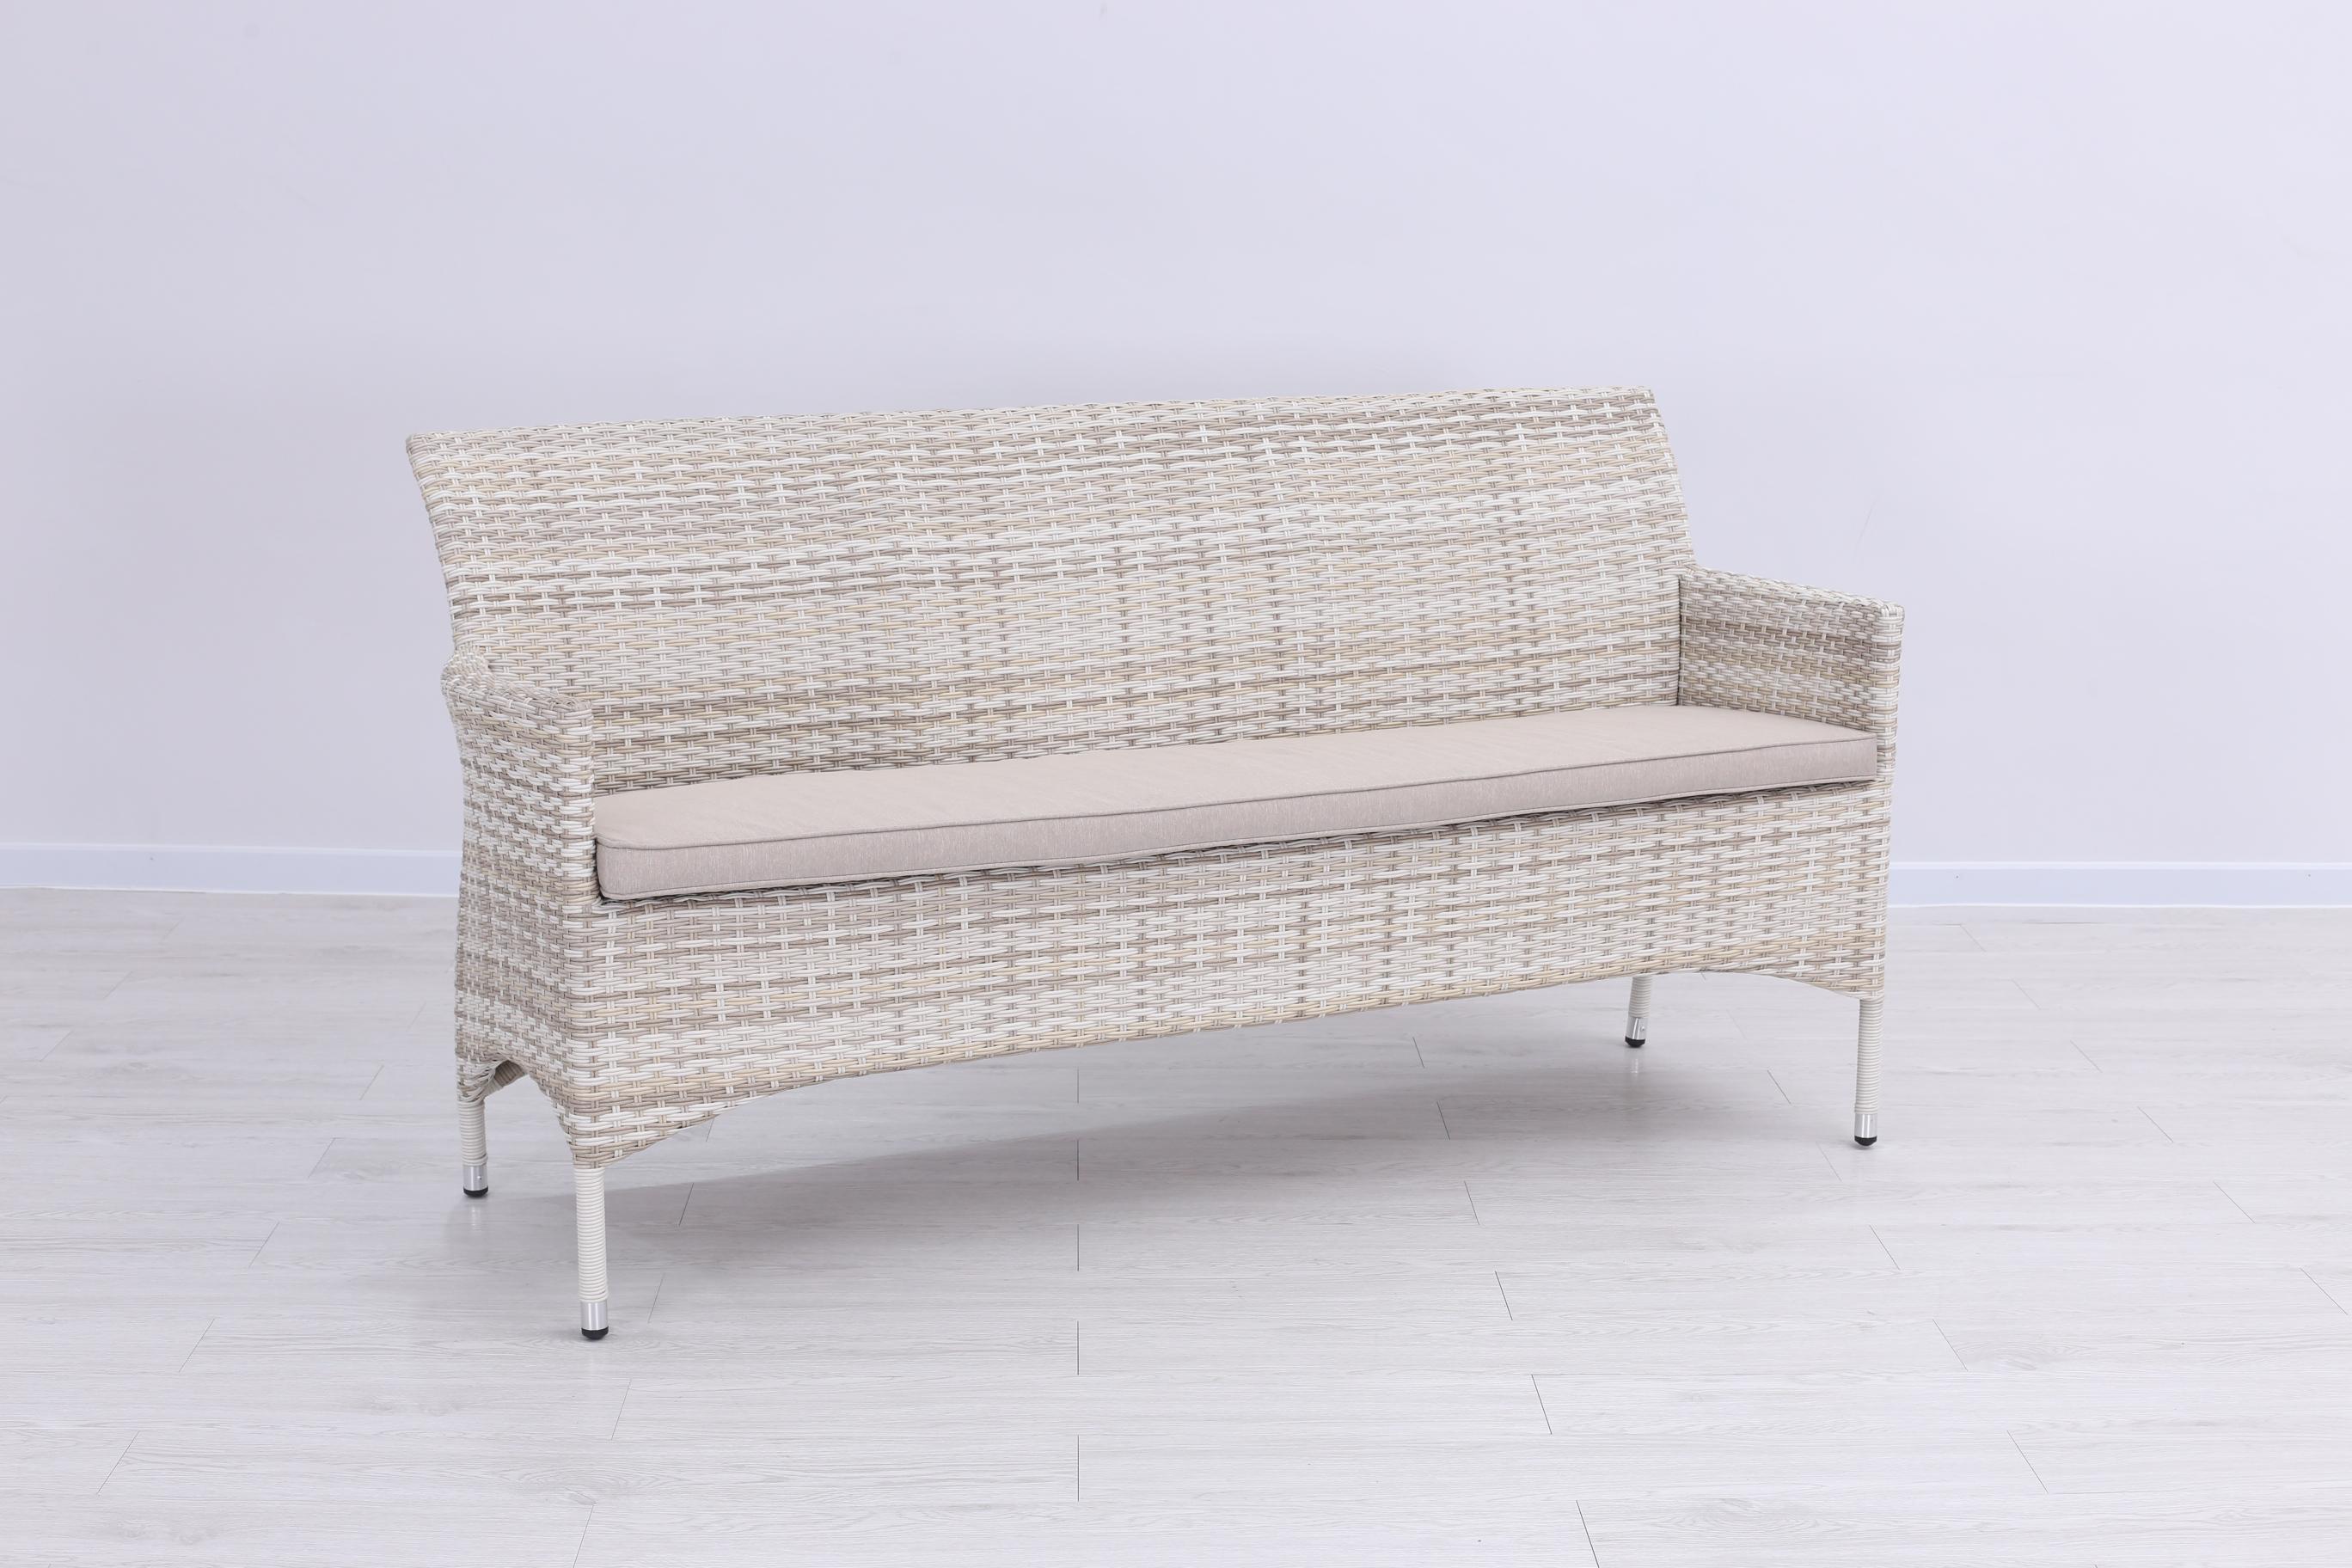 neueste gartenbank wetterfest aluminium schema garten design ideen. Black Bedroom Furniture Sets. Home Design Ideas